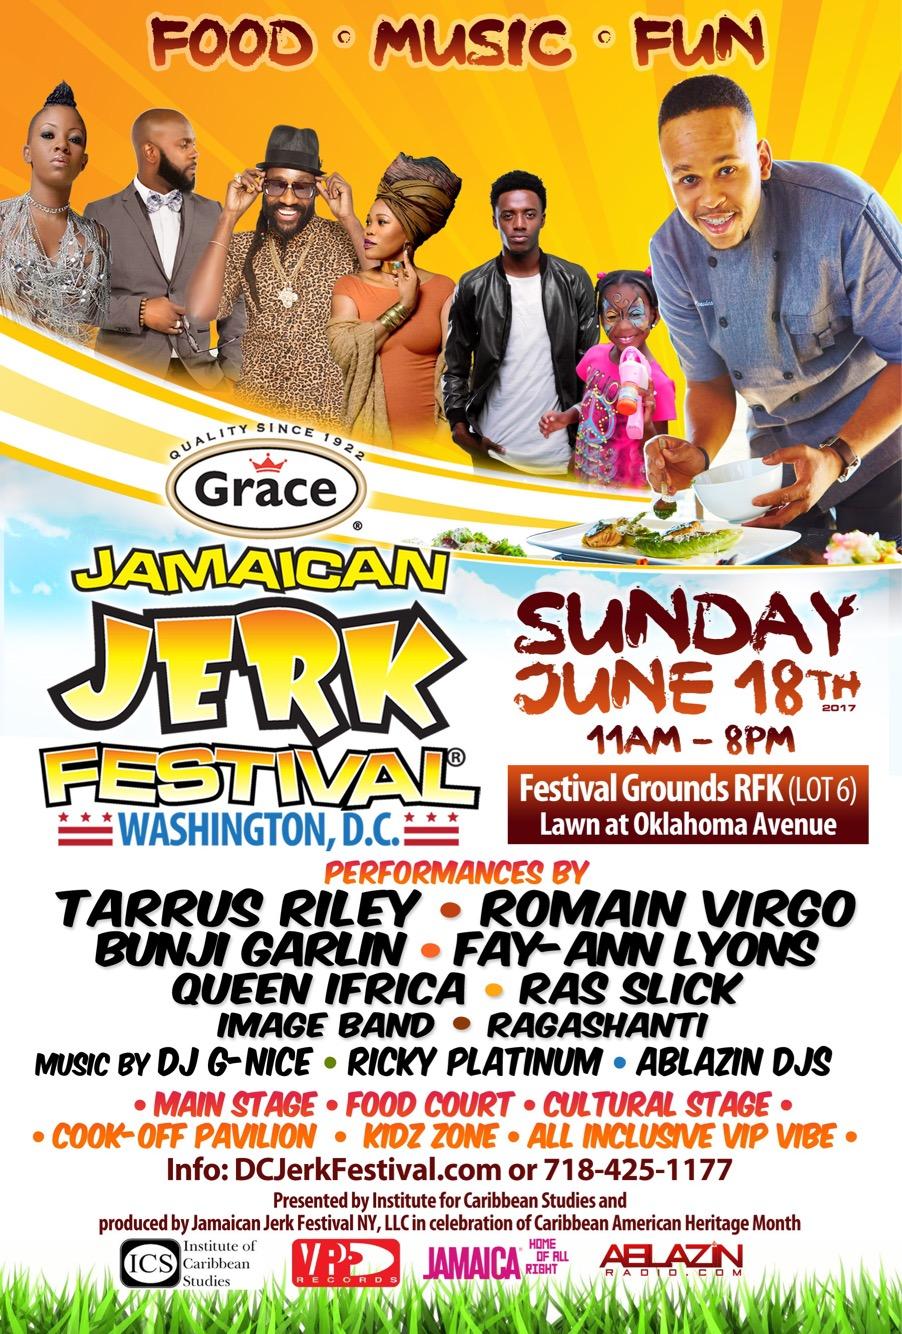 The 2nd Annual Grace Jamaican Jerk Festival Washington DC